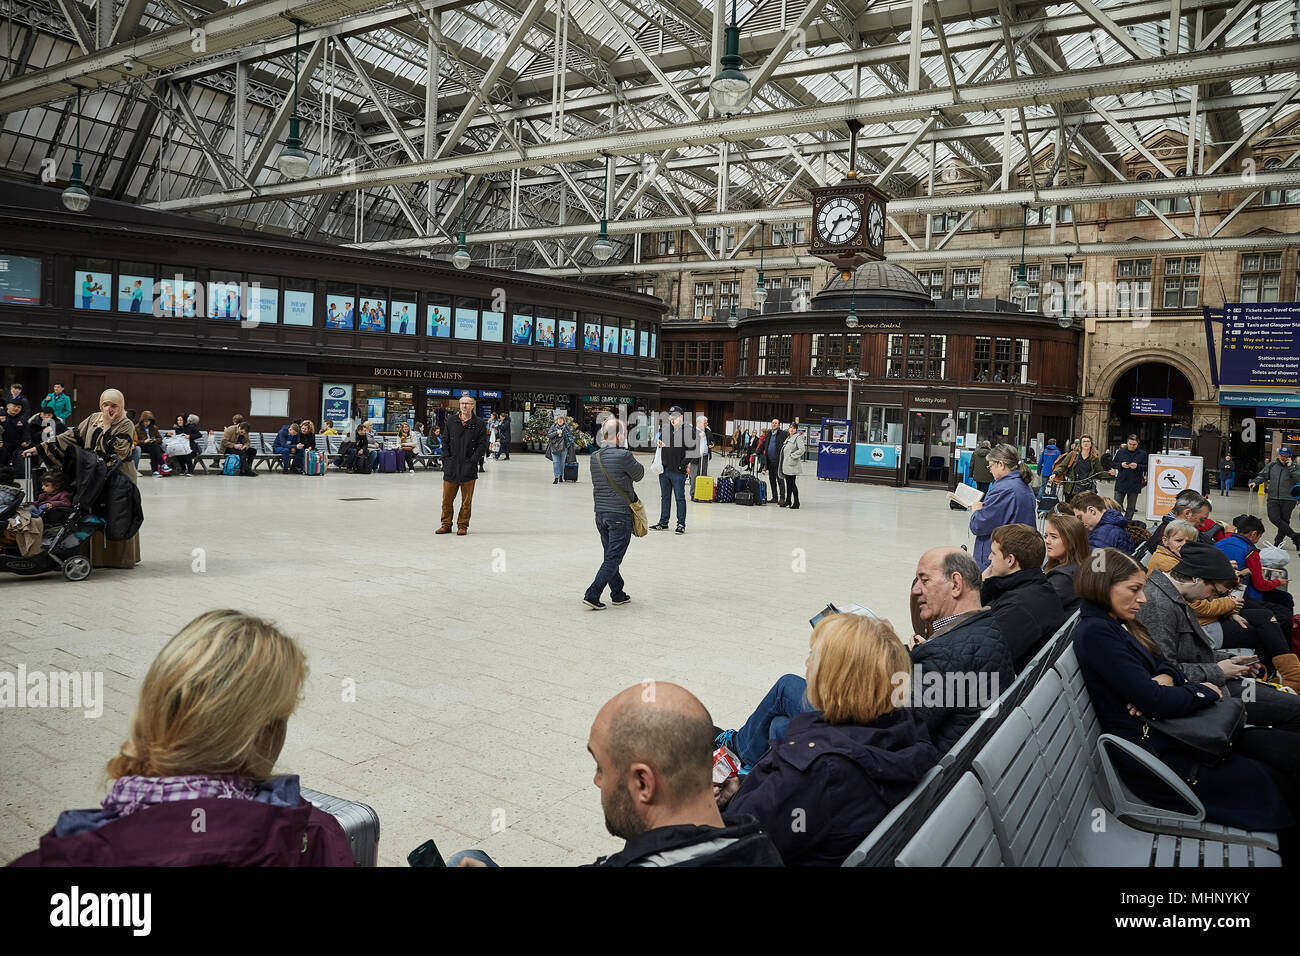 Glasgow in Scotland,   Glasgow Central - Stock Image